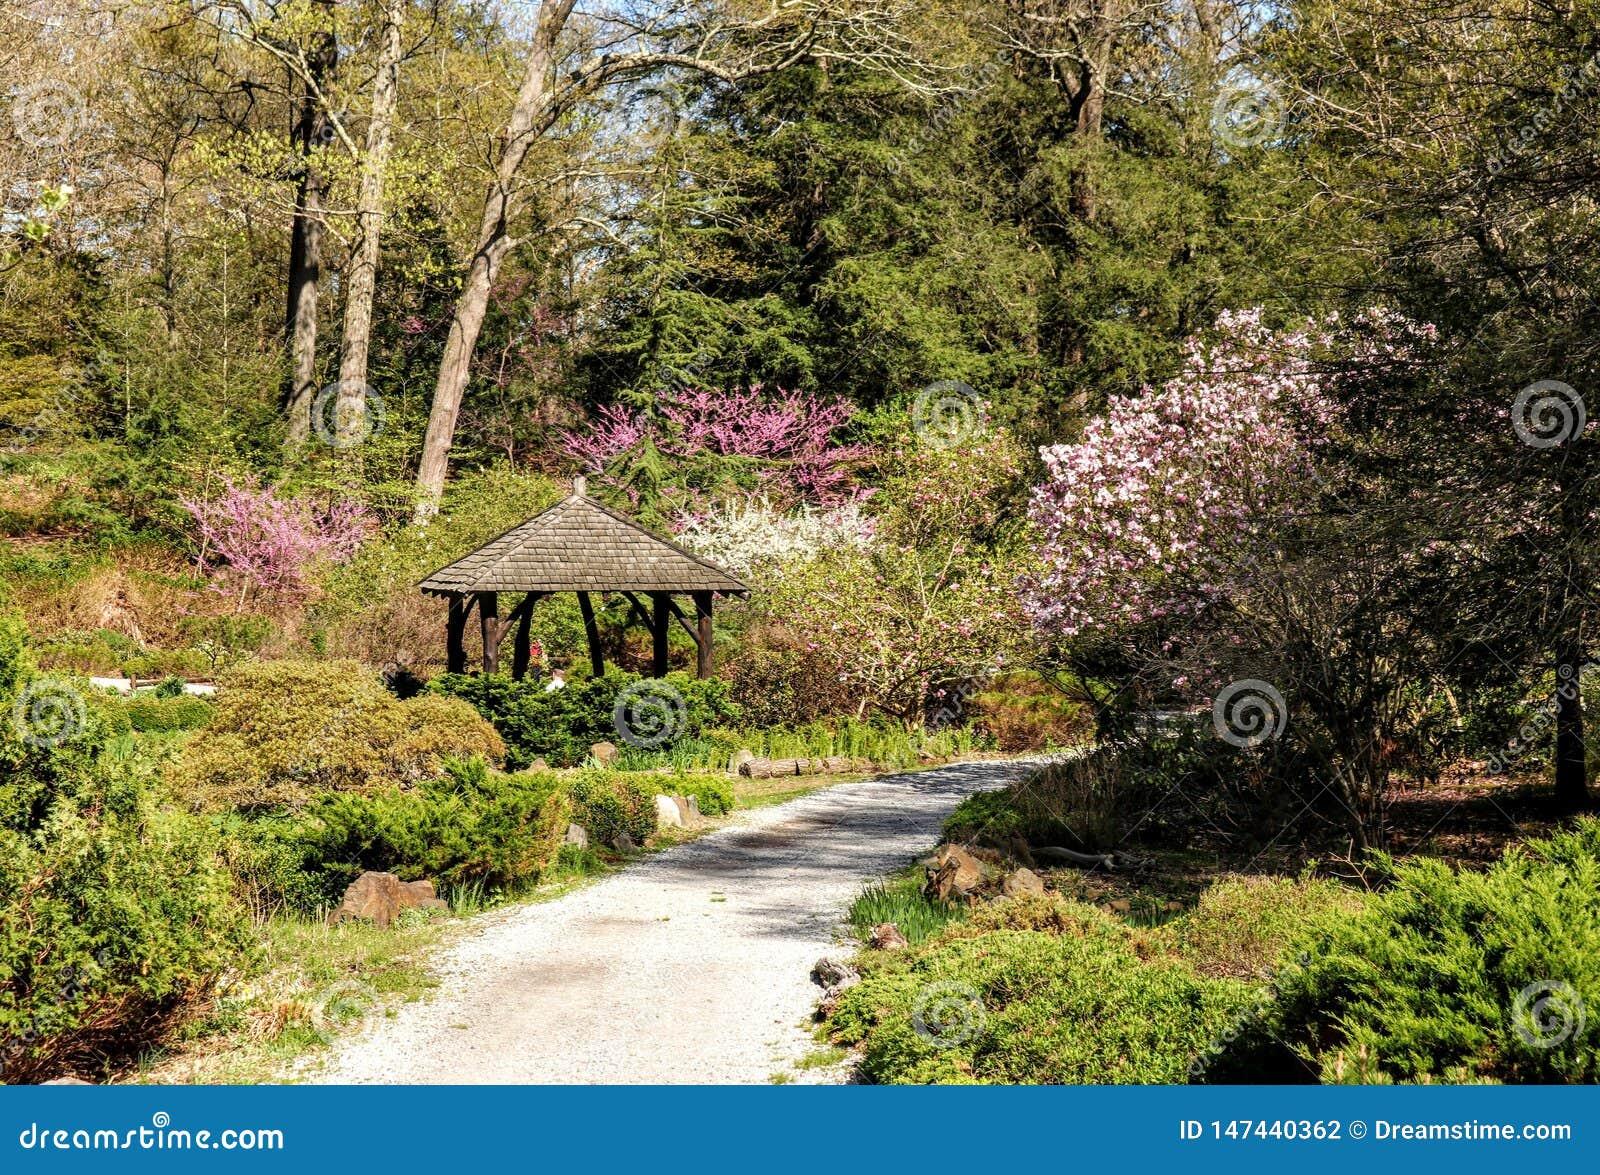 Gazebo with scenic views New Jersey park spiring 2019